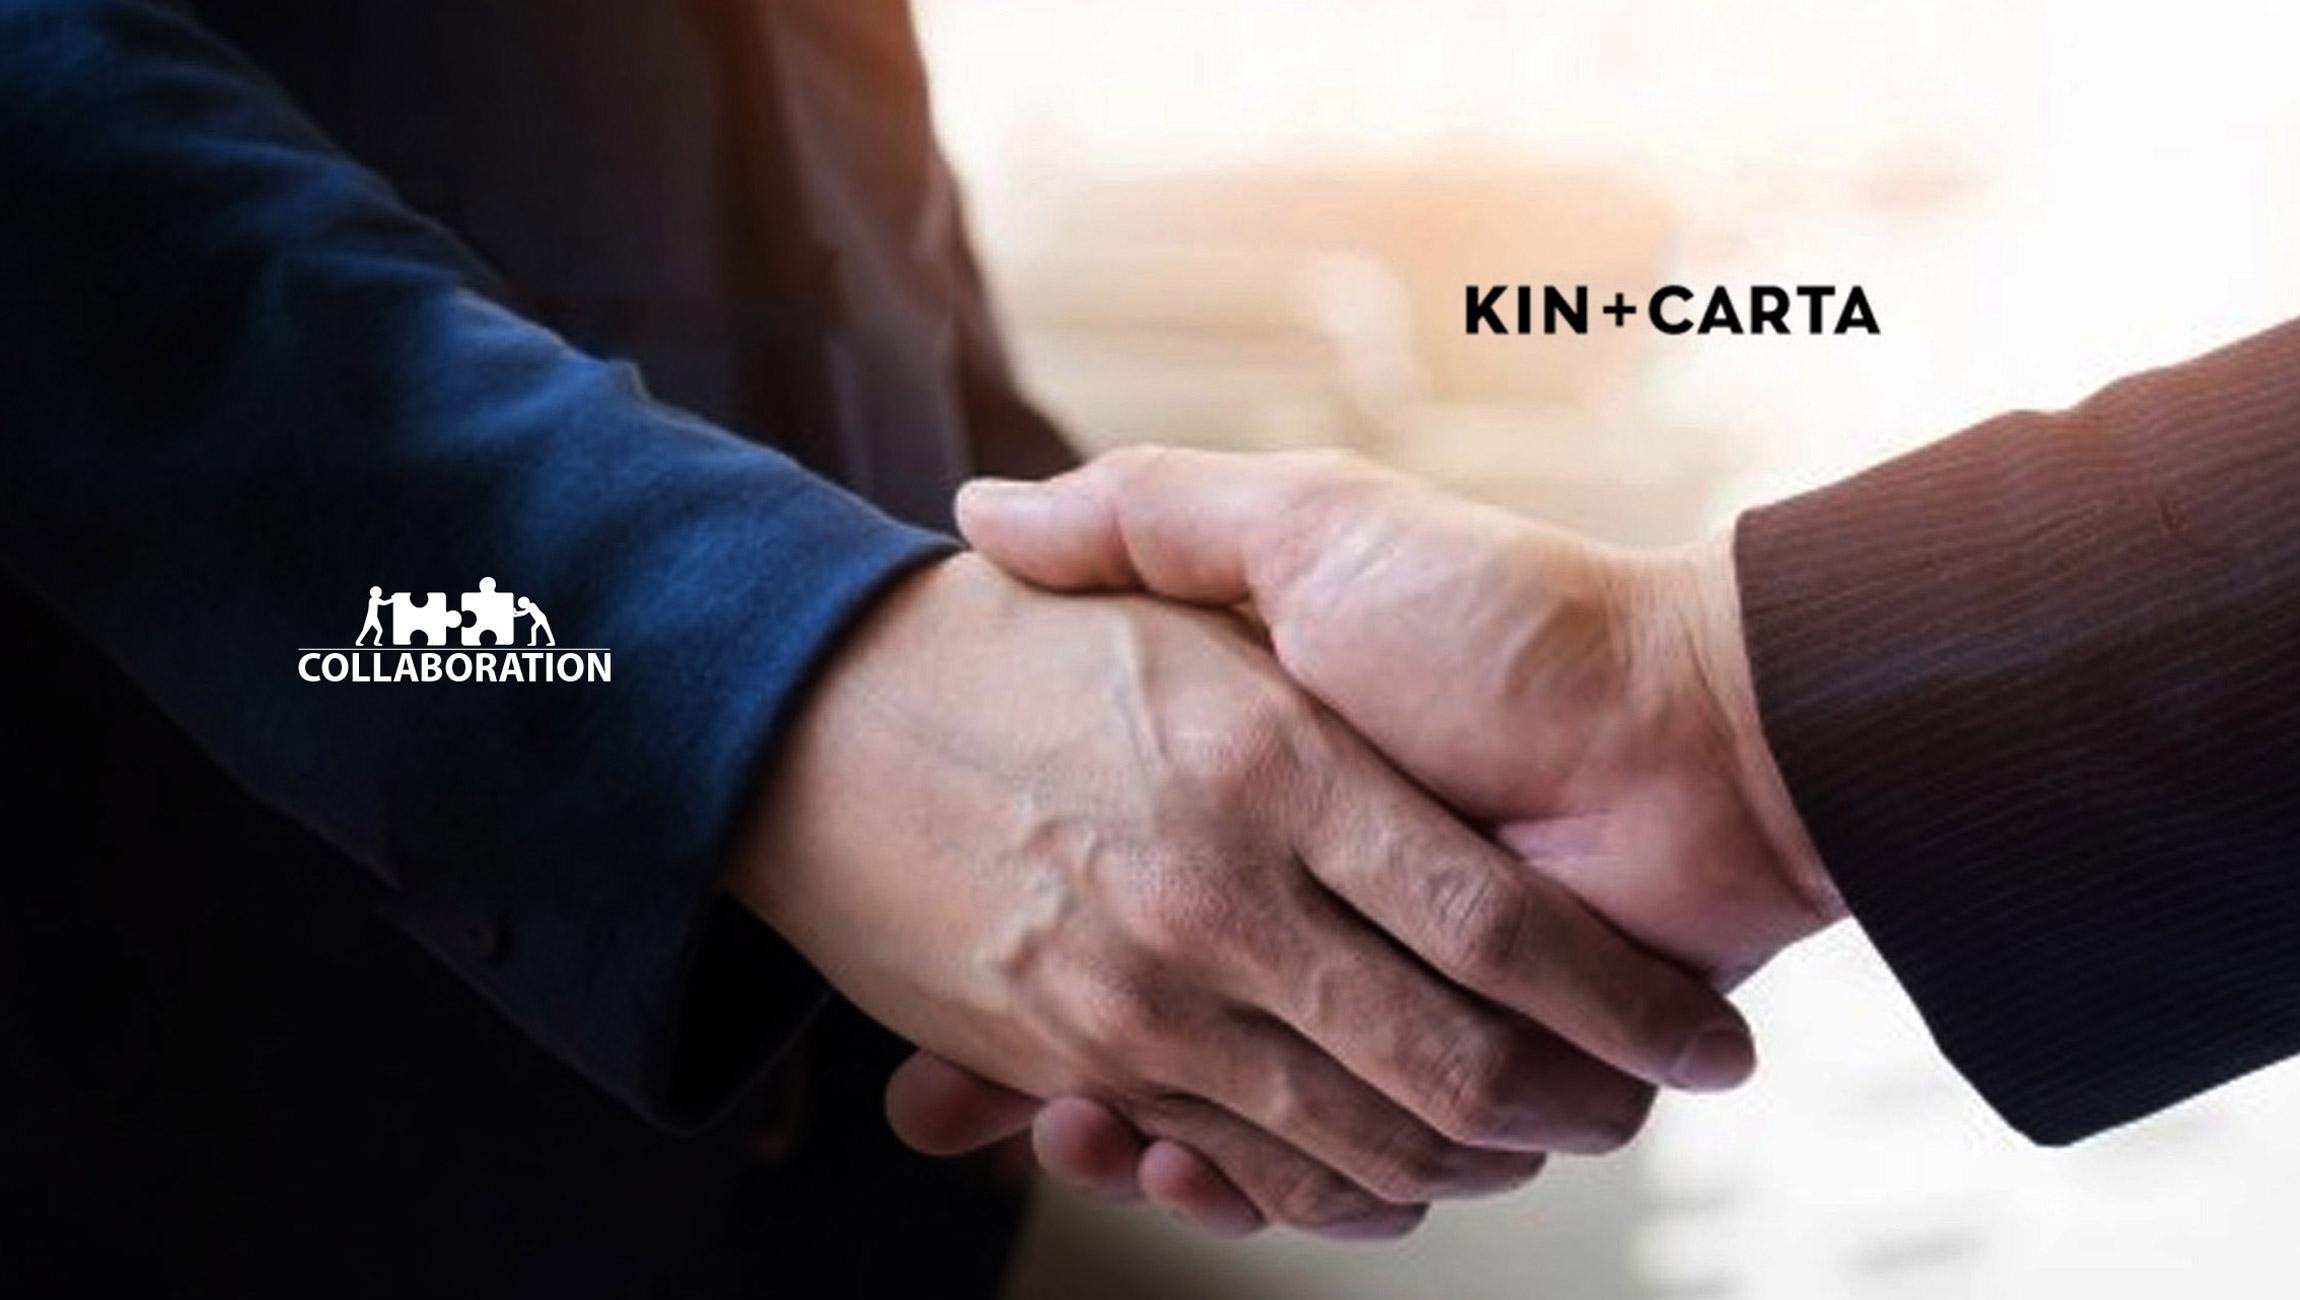 Kin + Carta: Partner for Google's Business Messages